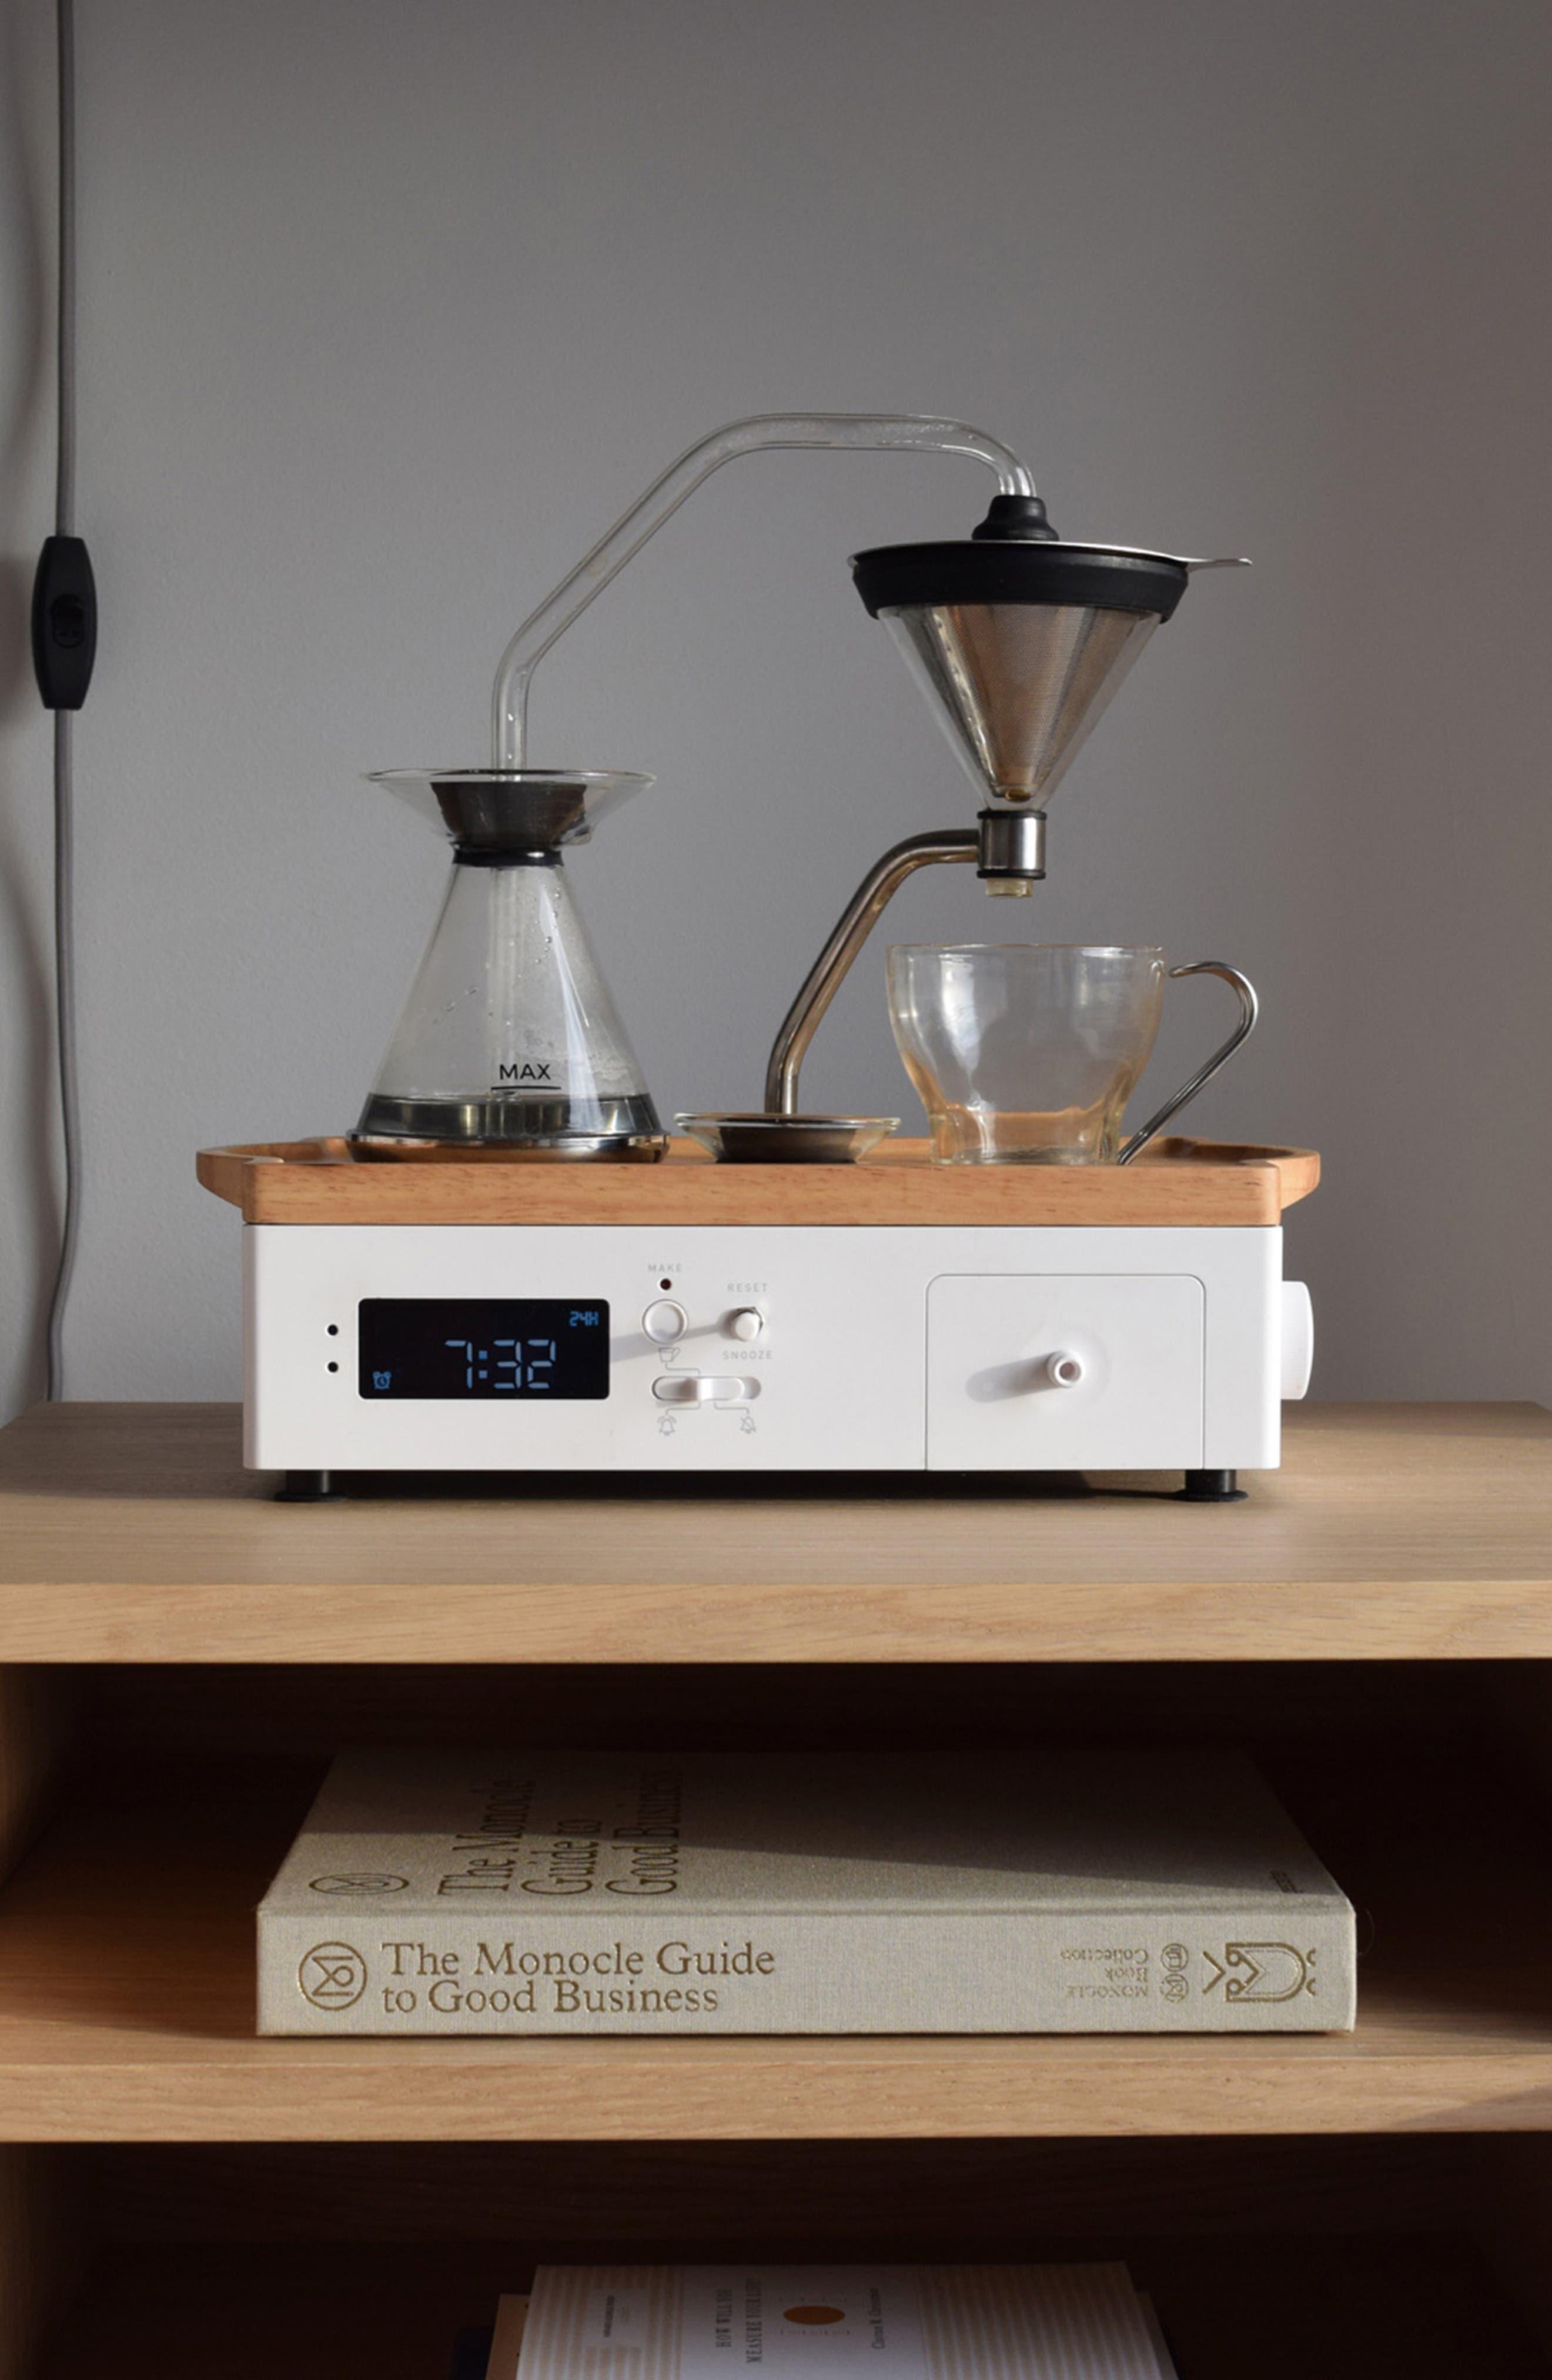 Soda Says x Barisieur Coffee & Tea Alarm Clock,                             Alternate thumbnail 11, color,                             WHITE/ RUBBERWOOD